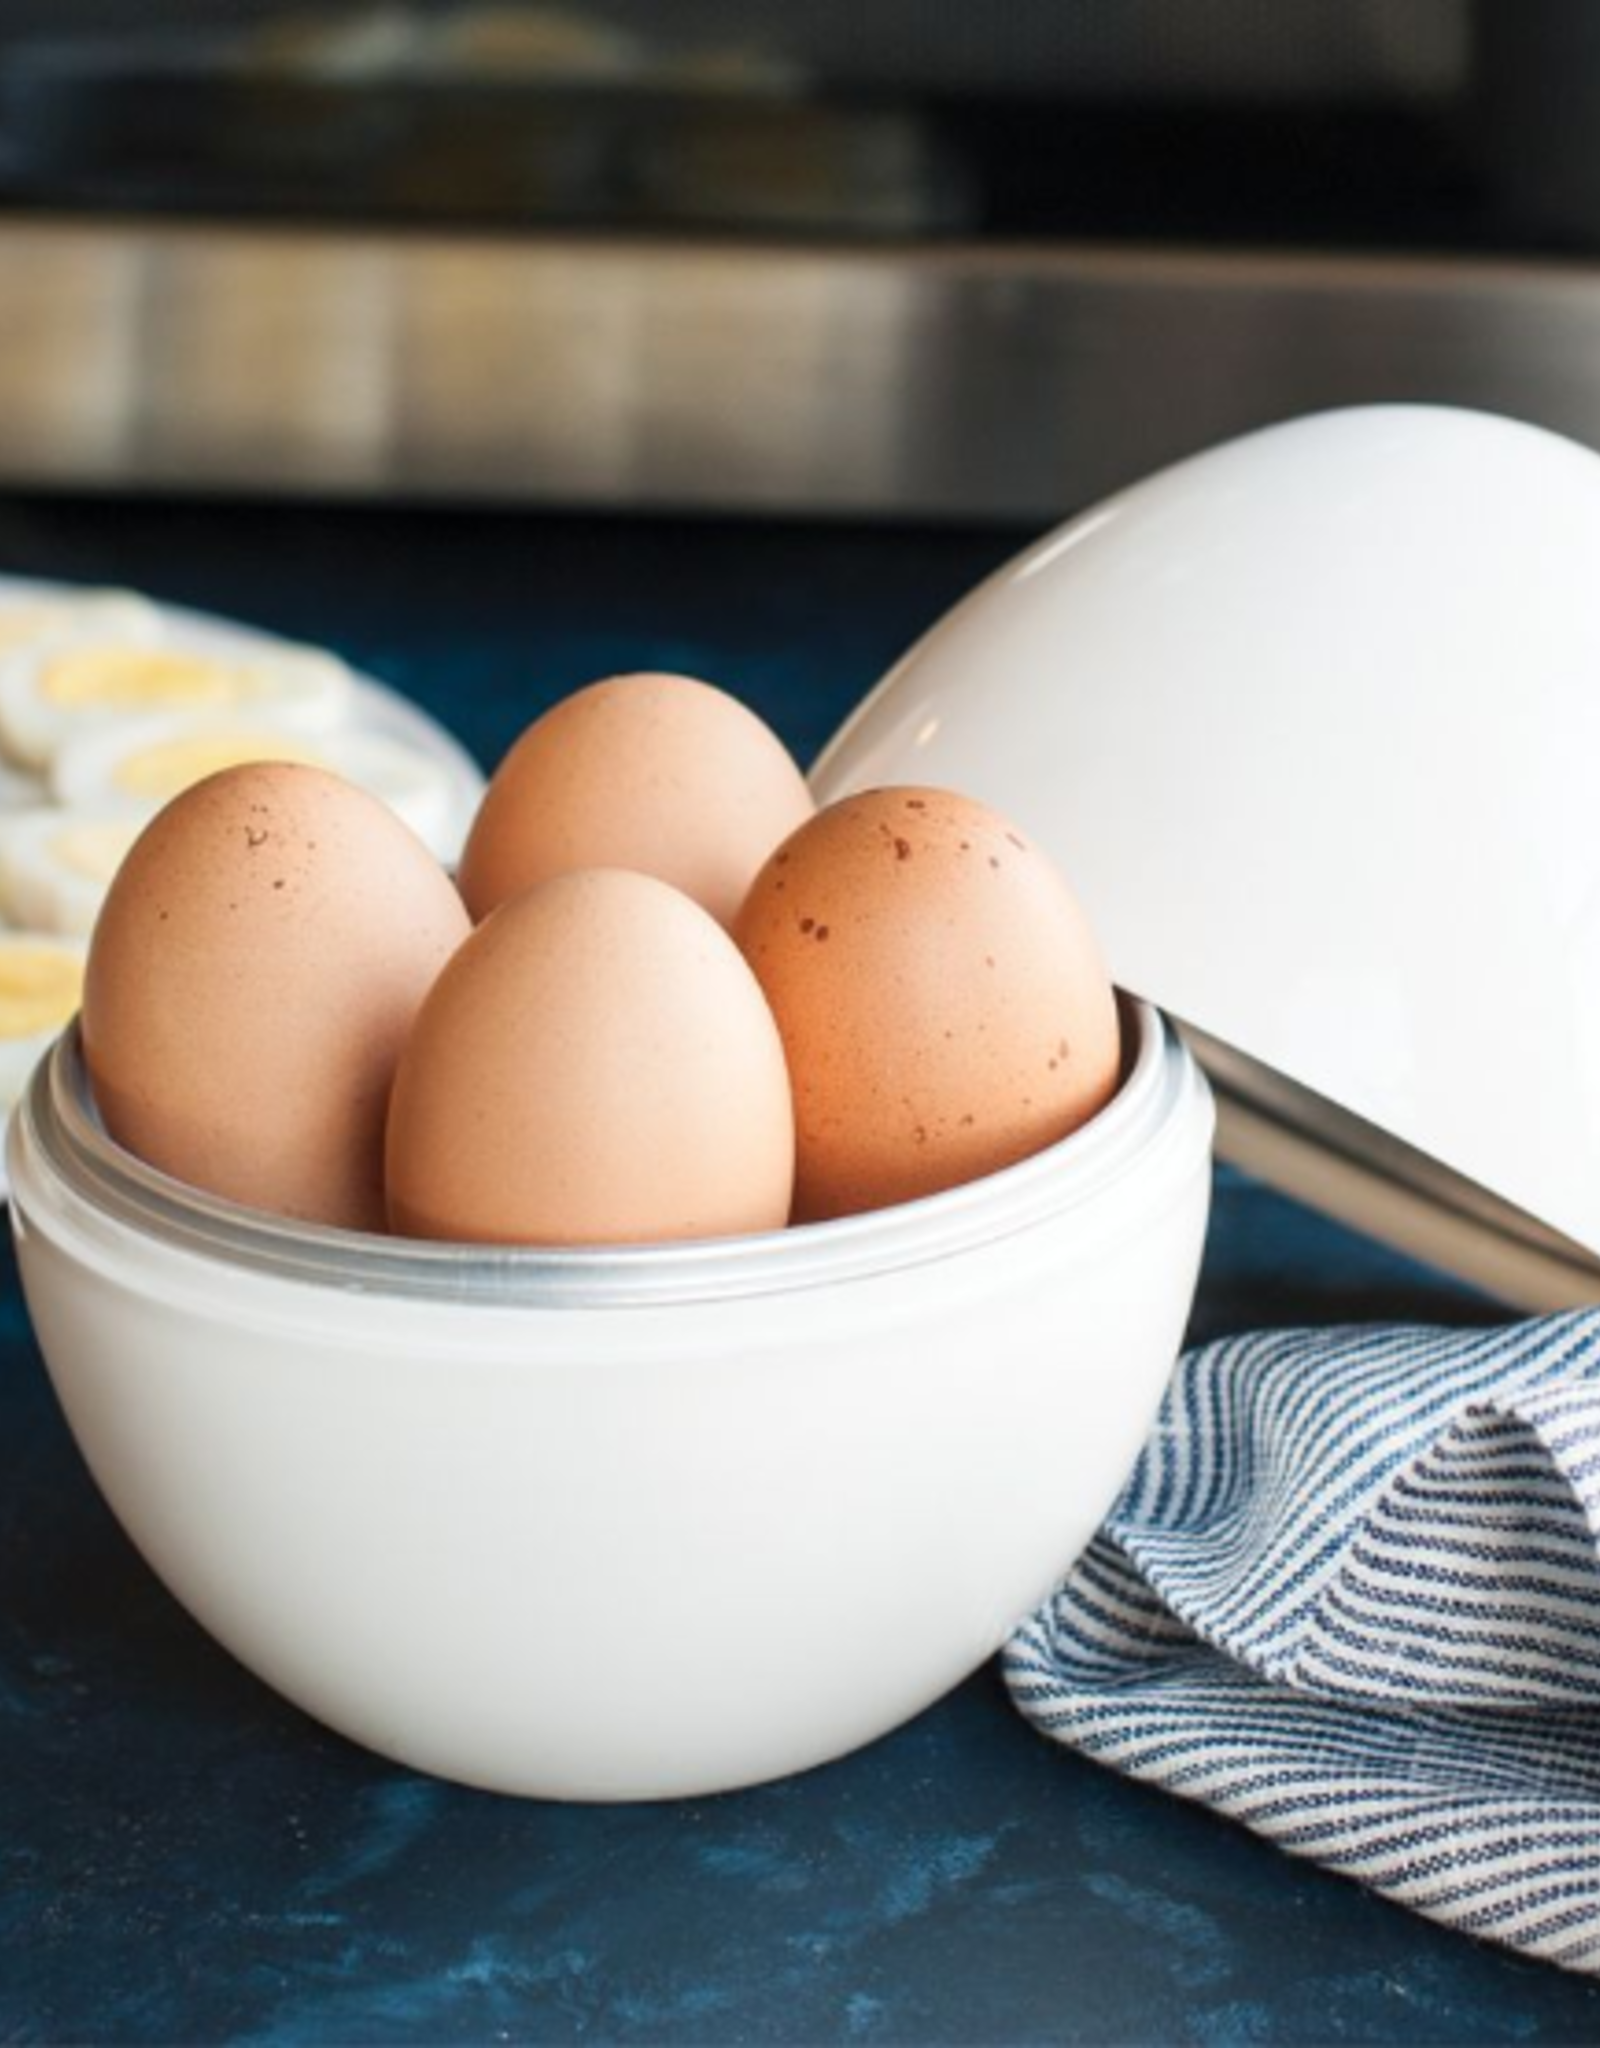 Nordicware Microwave Egg Boiler